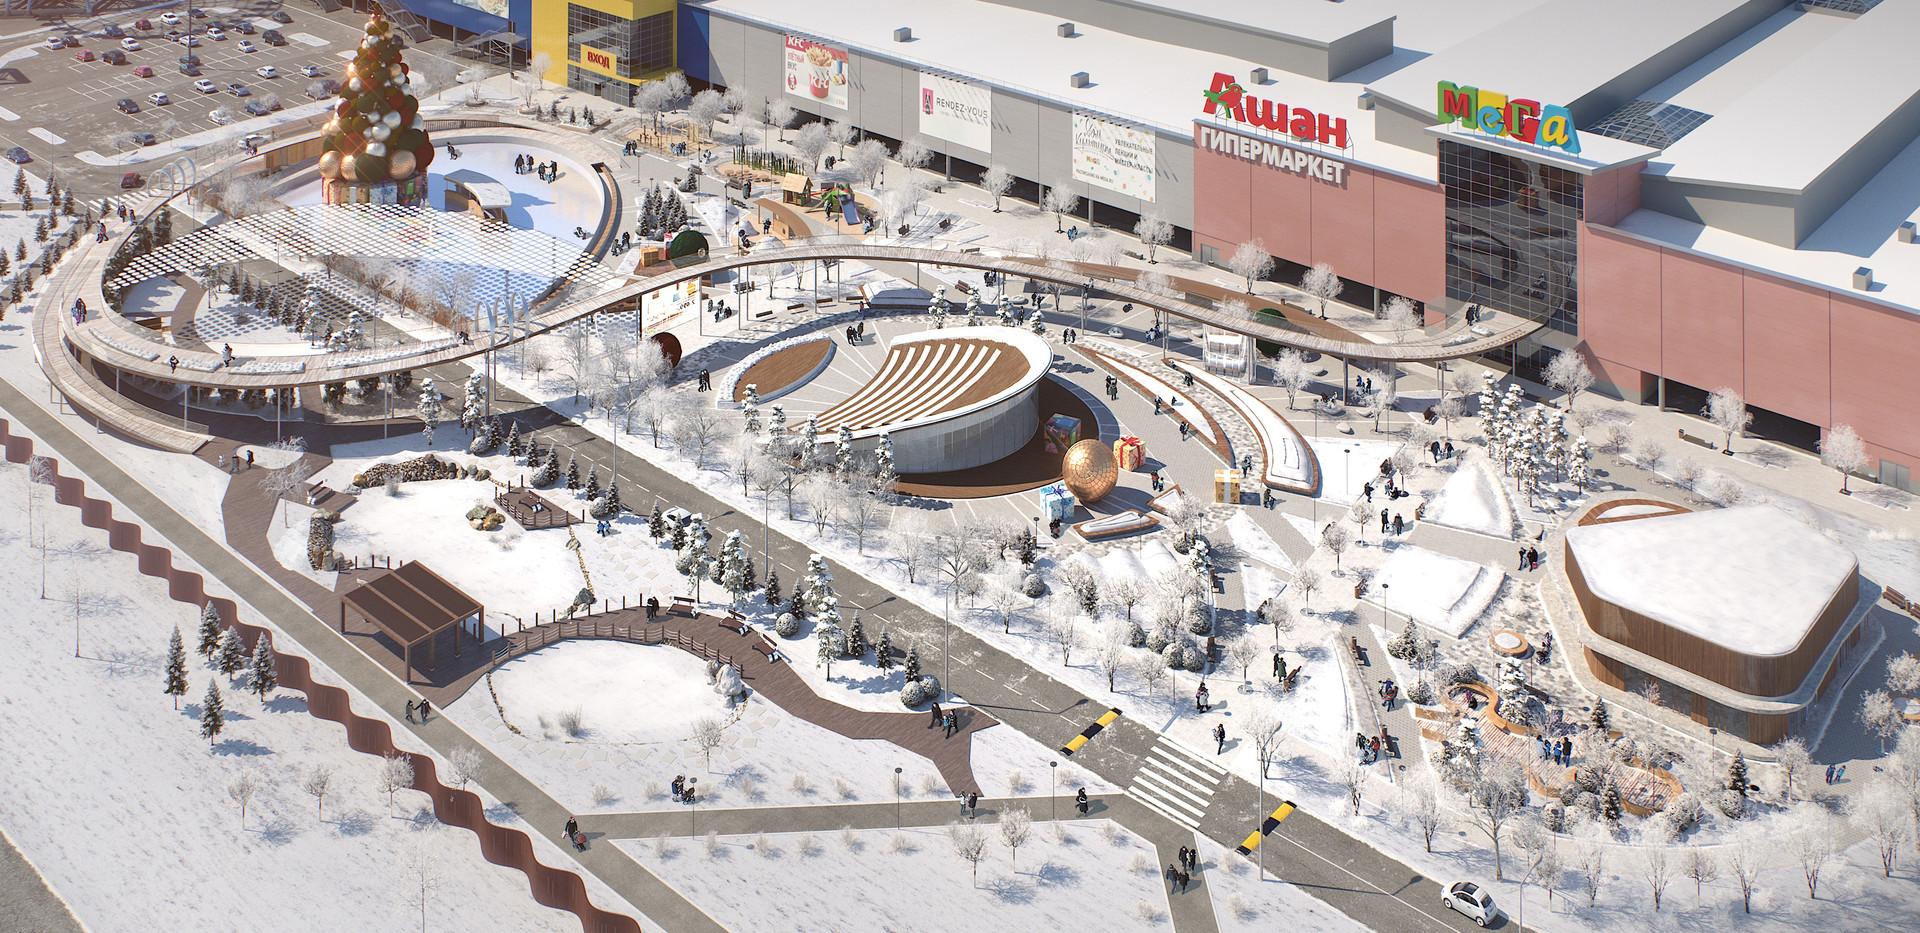 Арт Хаус проект Мега Парка-общий план-2j